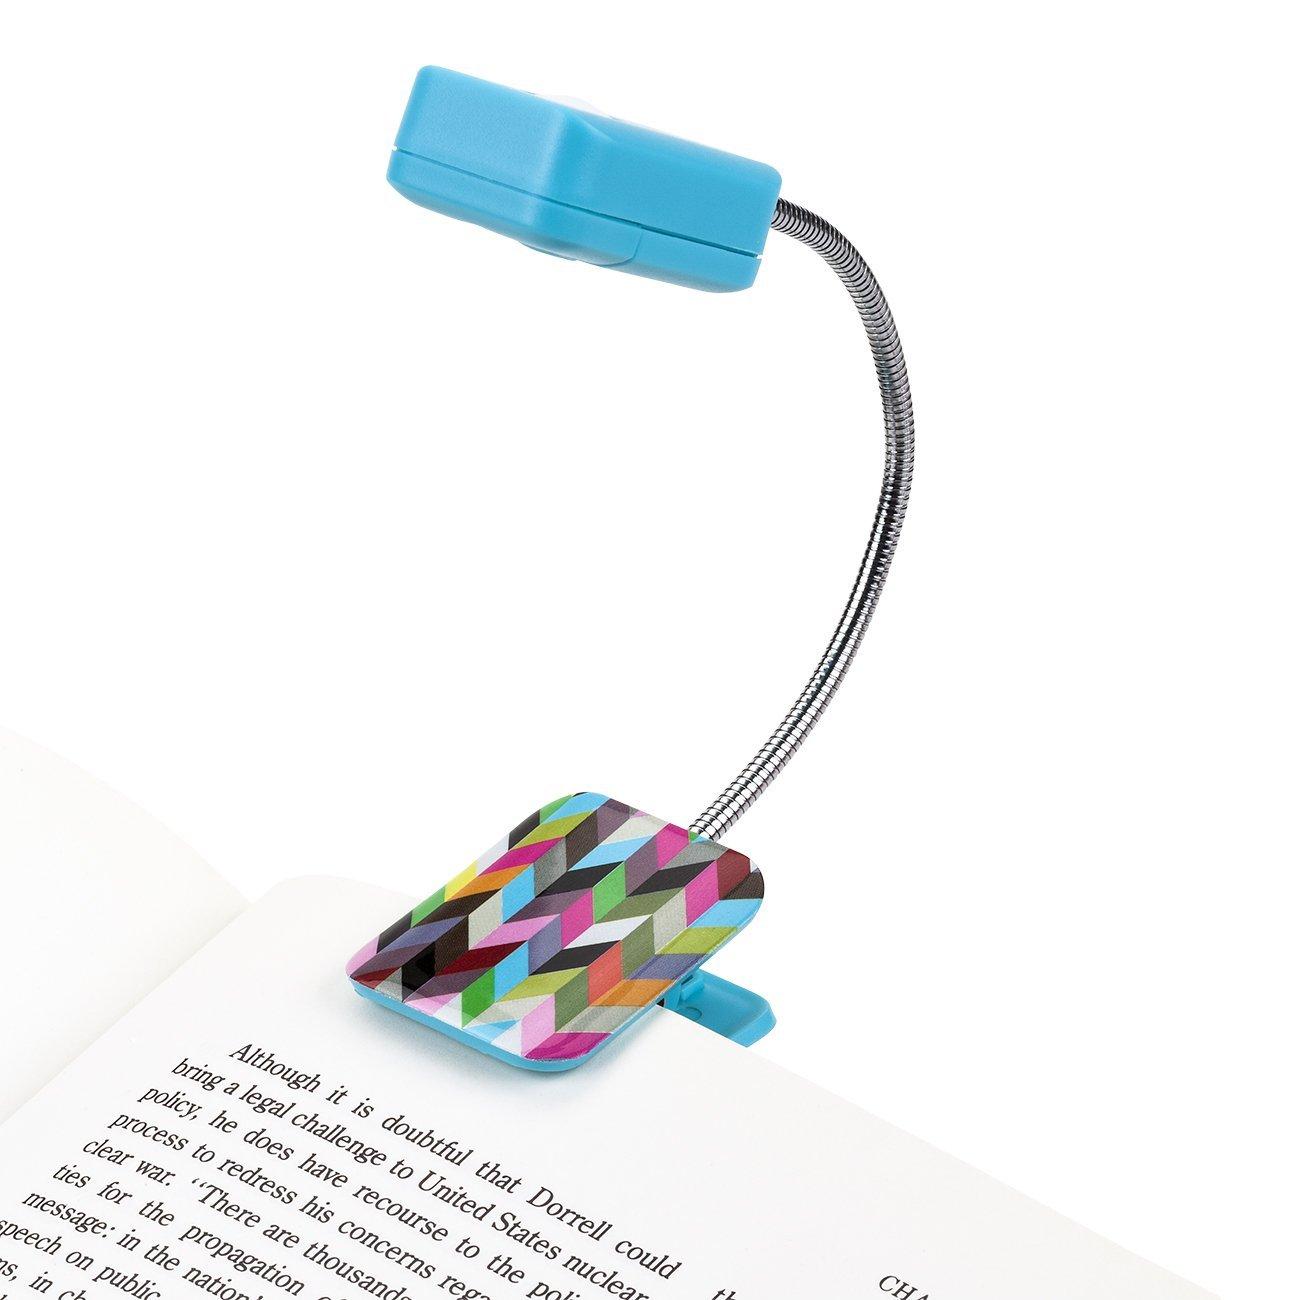 led book light by french bull - ziggy - led book light - WBZGULI